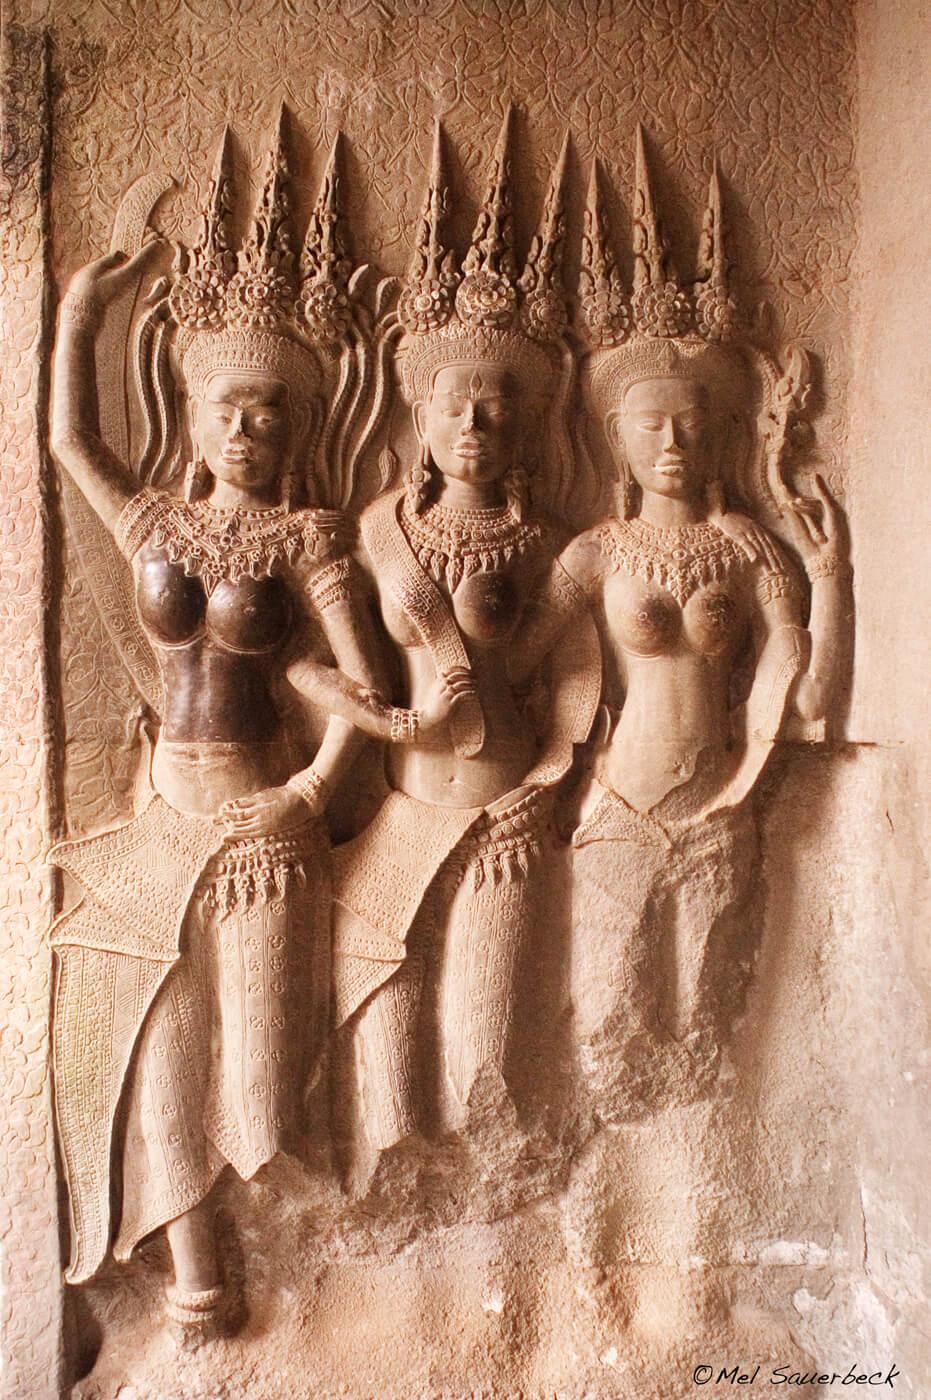 Statue of three goddesses, Angkor Wat, Cambodia